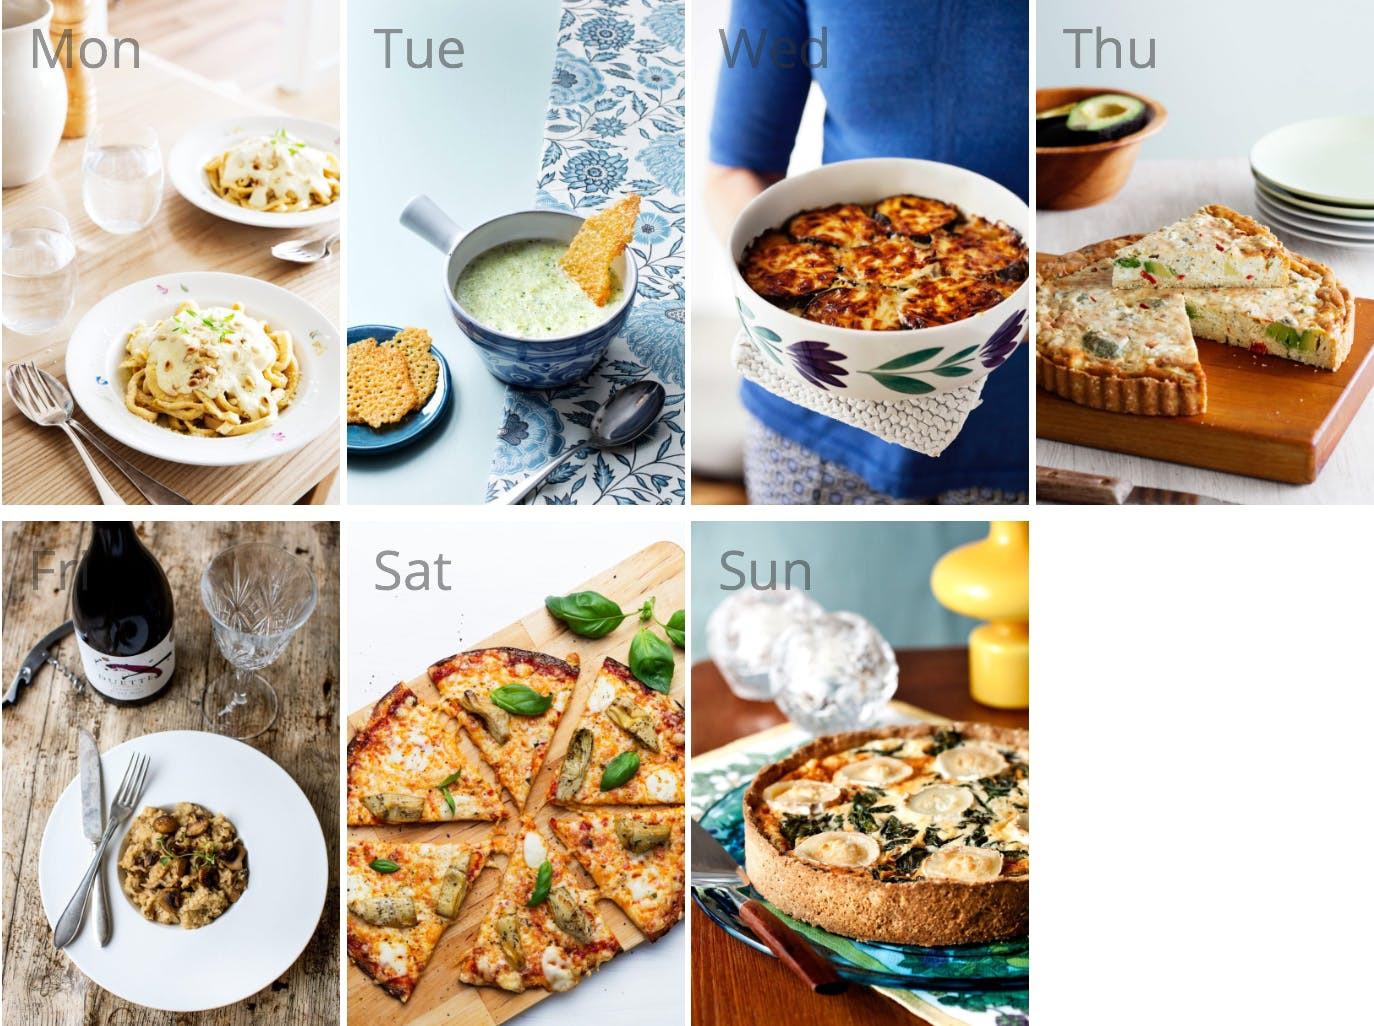 Low Carb Vegan Diet Plan  6 meal plan Ve arian low carb Diet Doctor